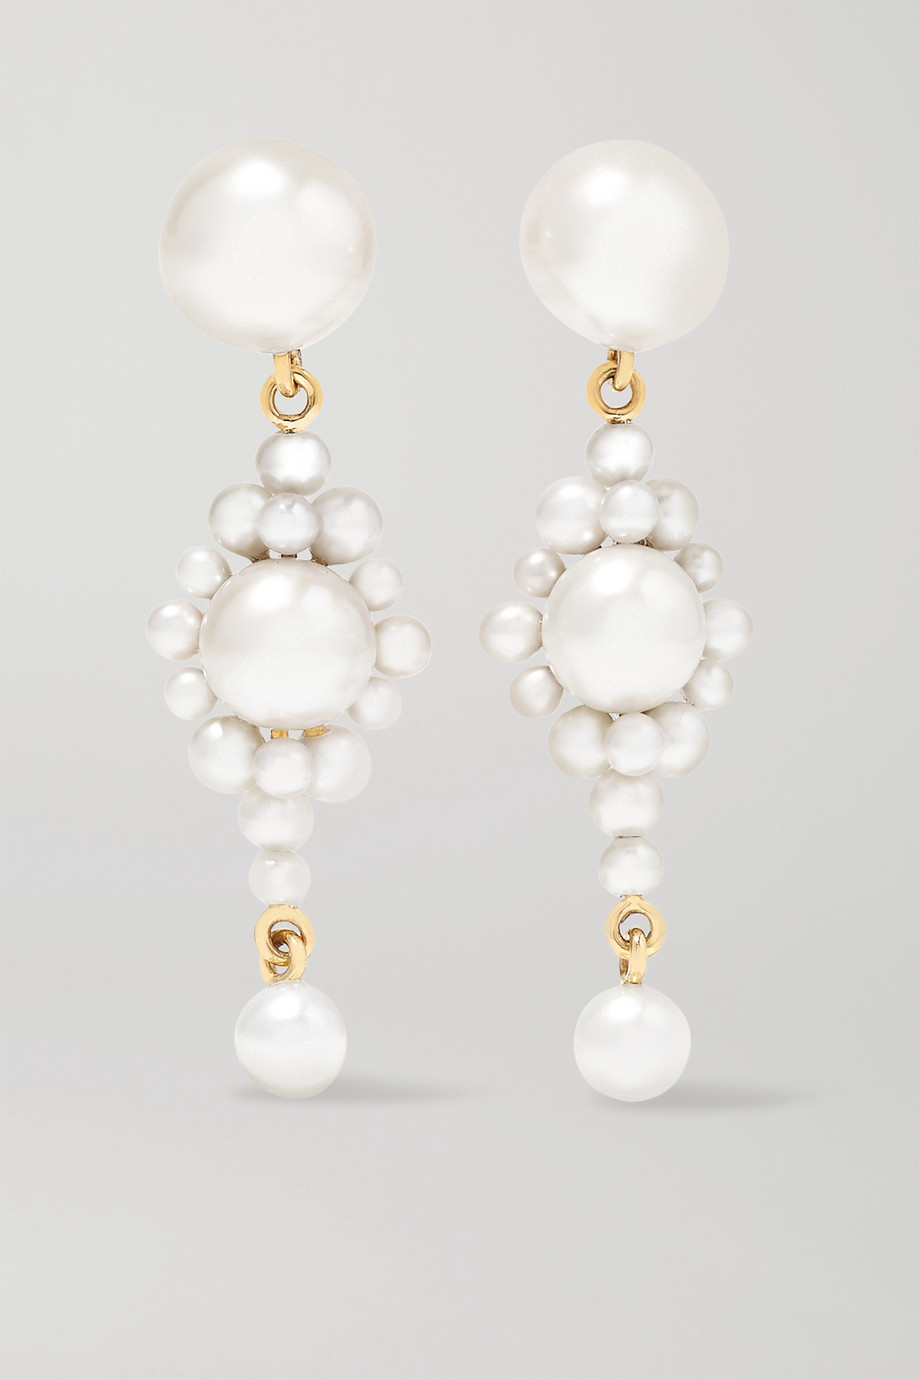 Sophie Bille Brahe Venezia 14-karat gold pearl earrings